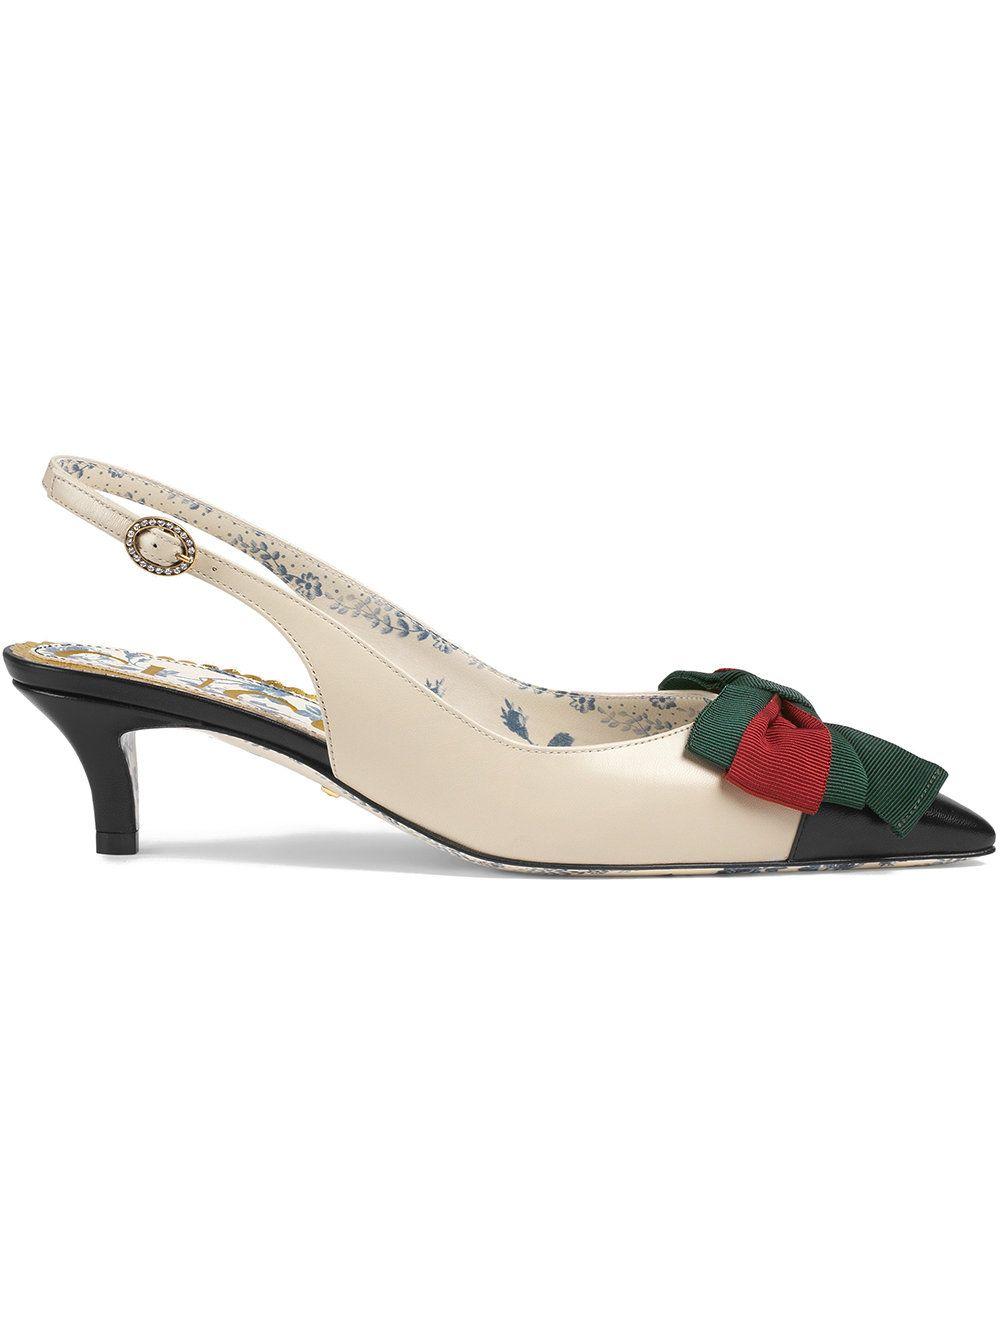 Givenchy White & Black Sackville Slingback Heels Gx7HSUtCW